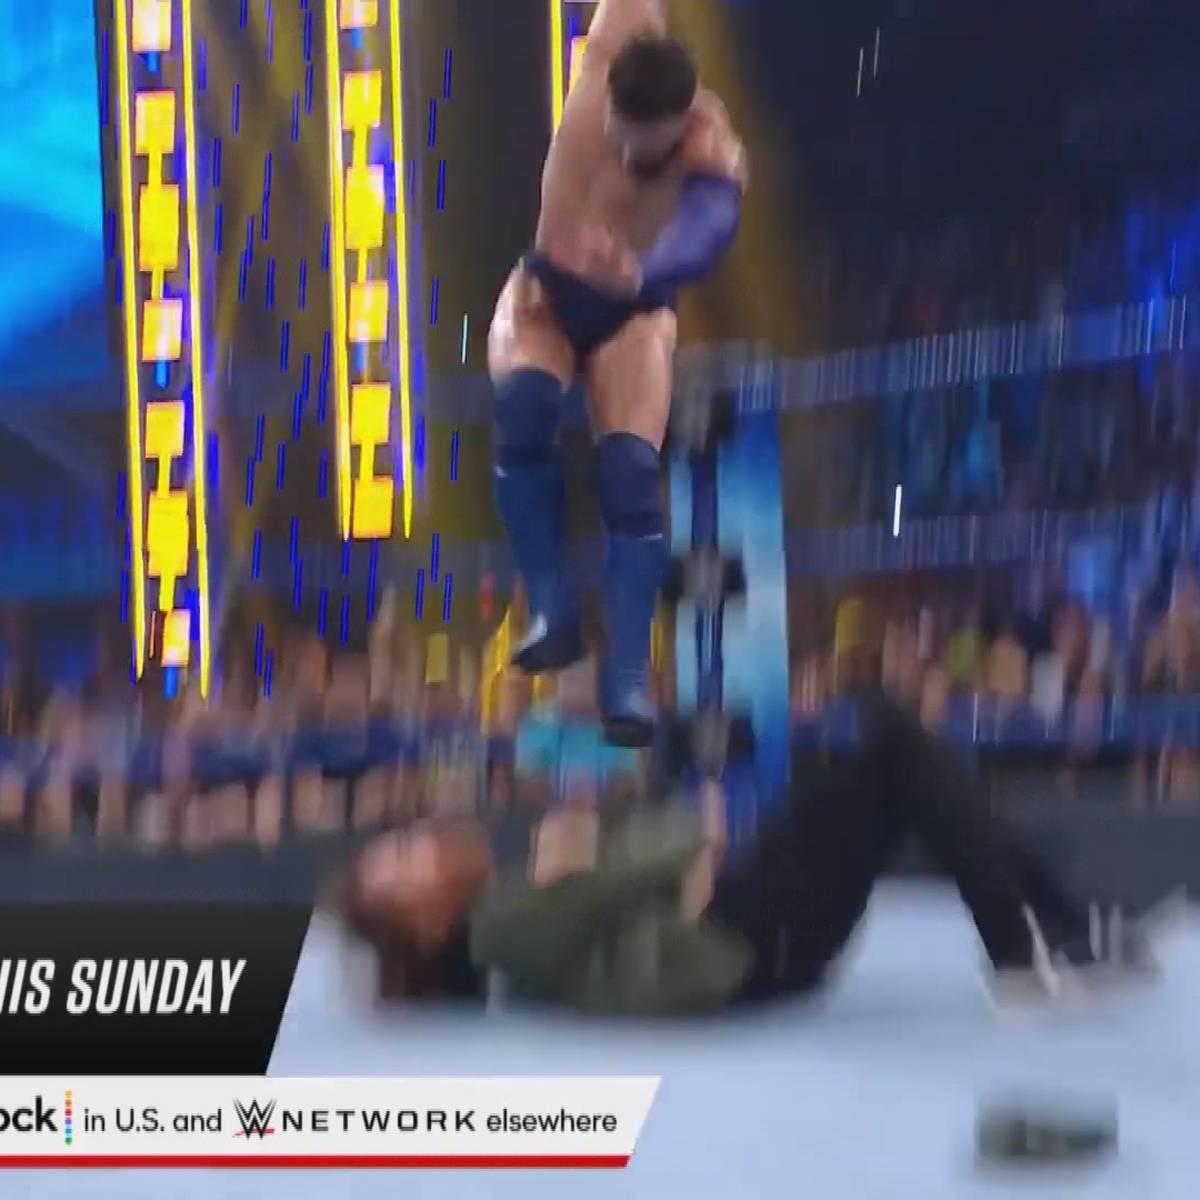 Hier bejubeln die WWE-Fans ein großes Comeback